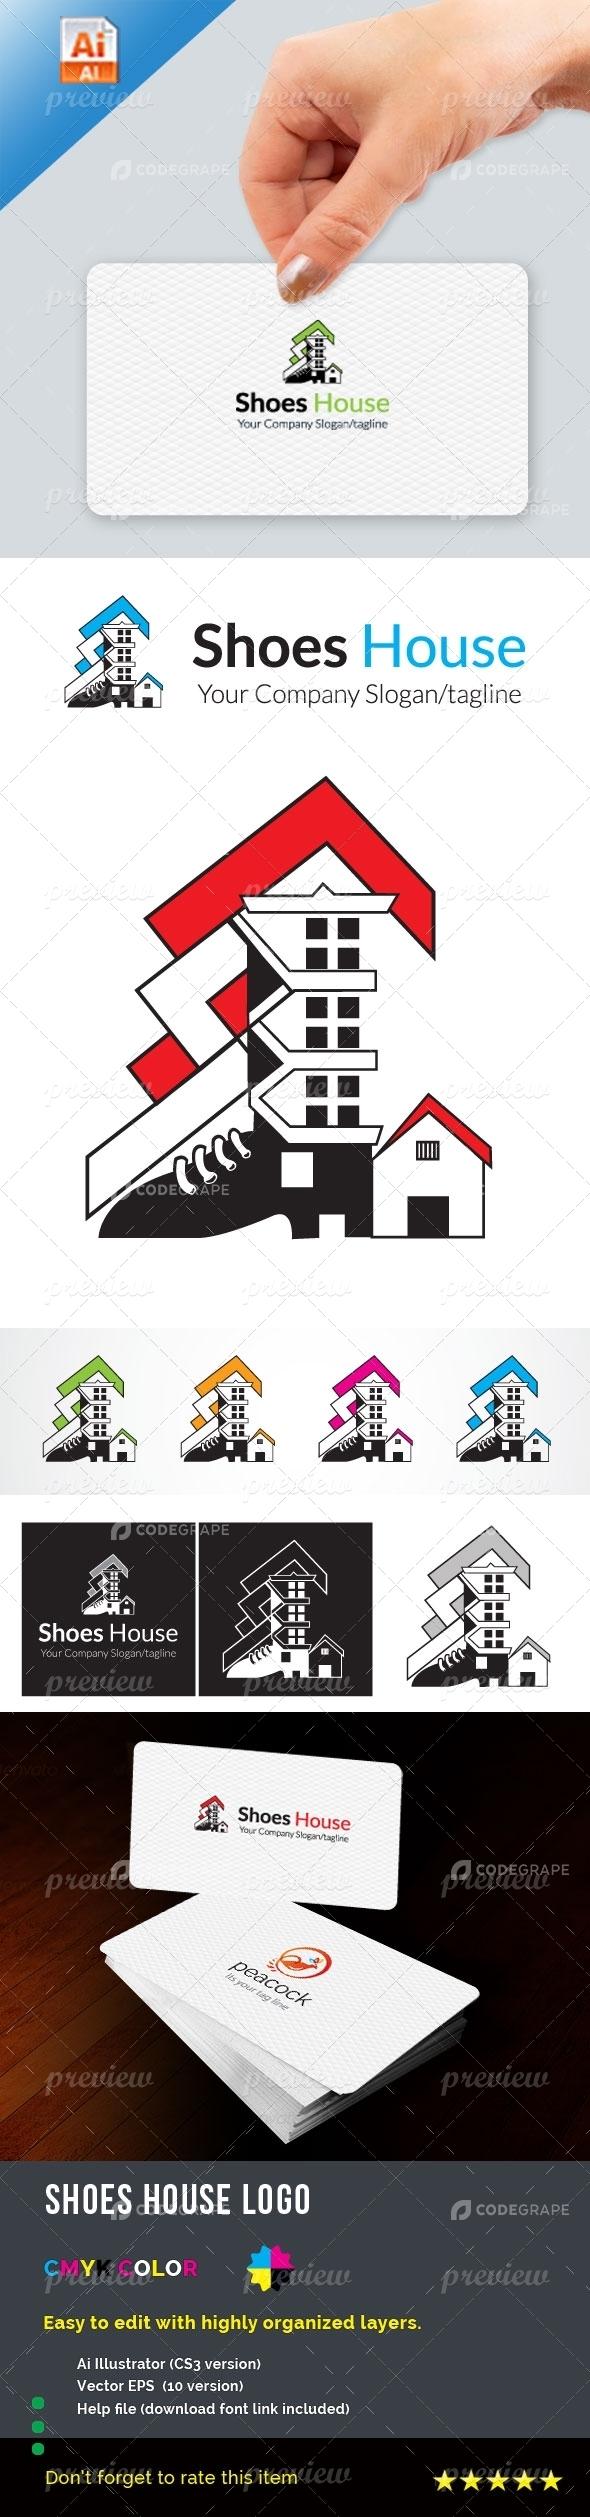 Shoes House Logo